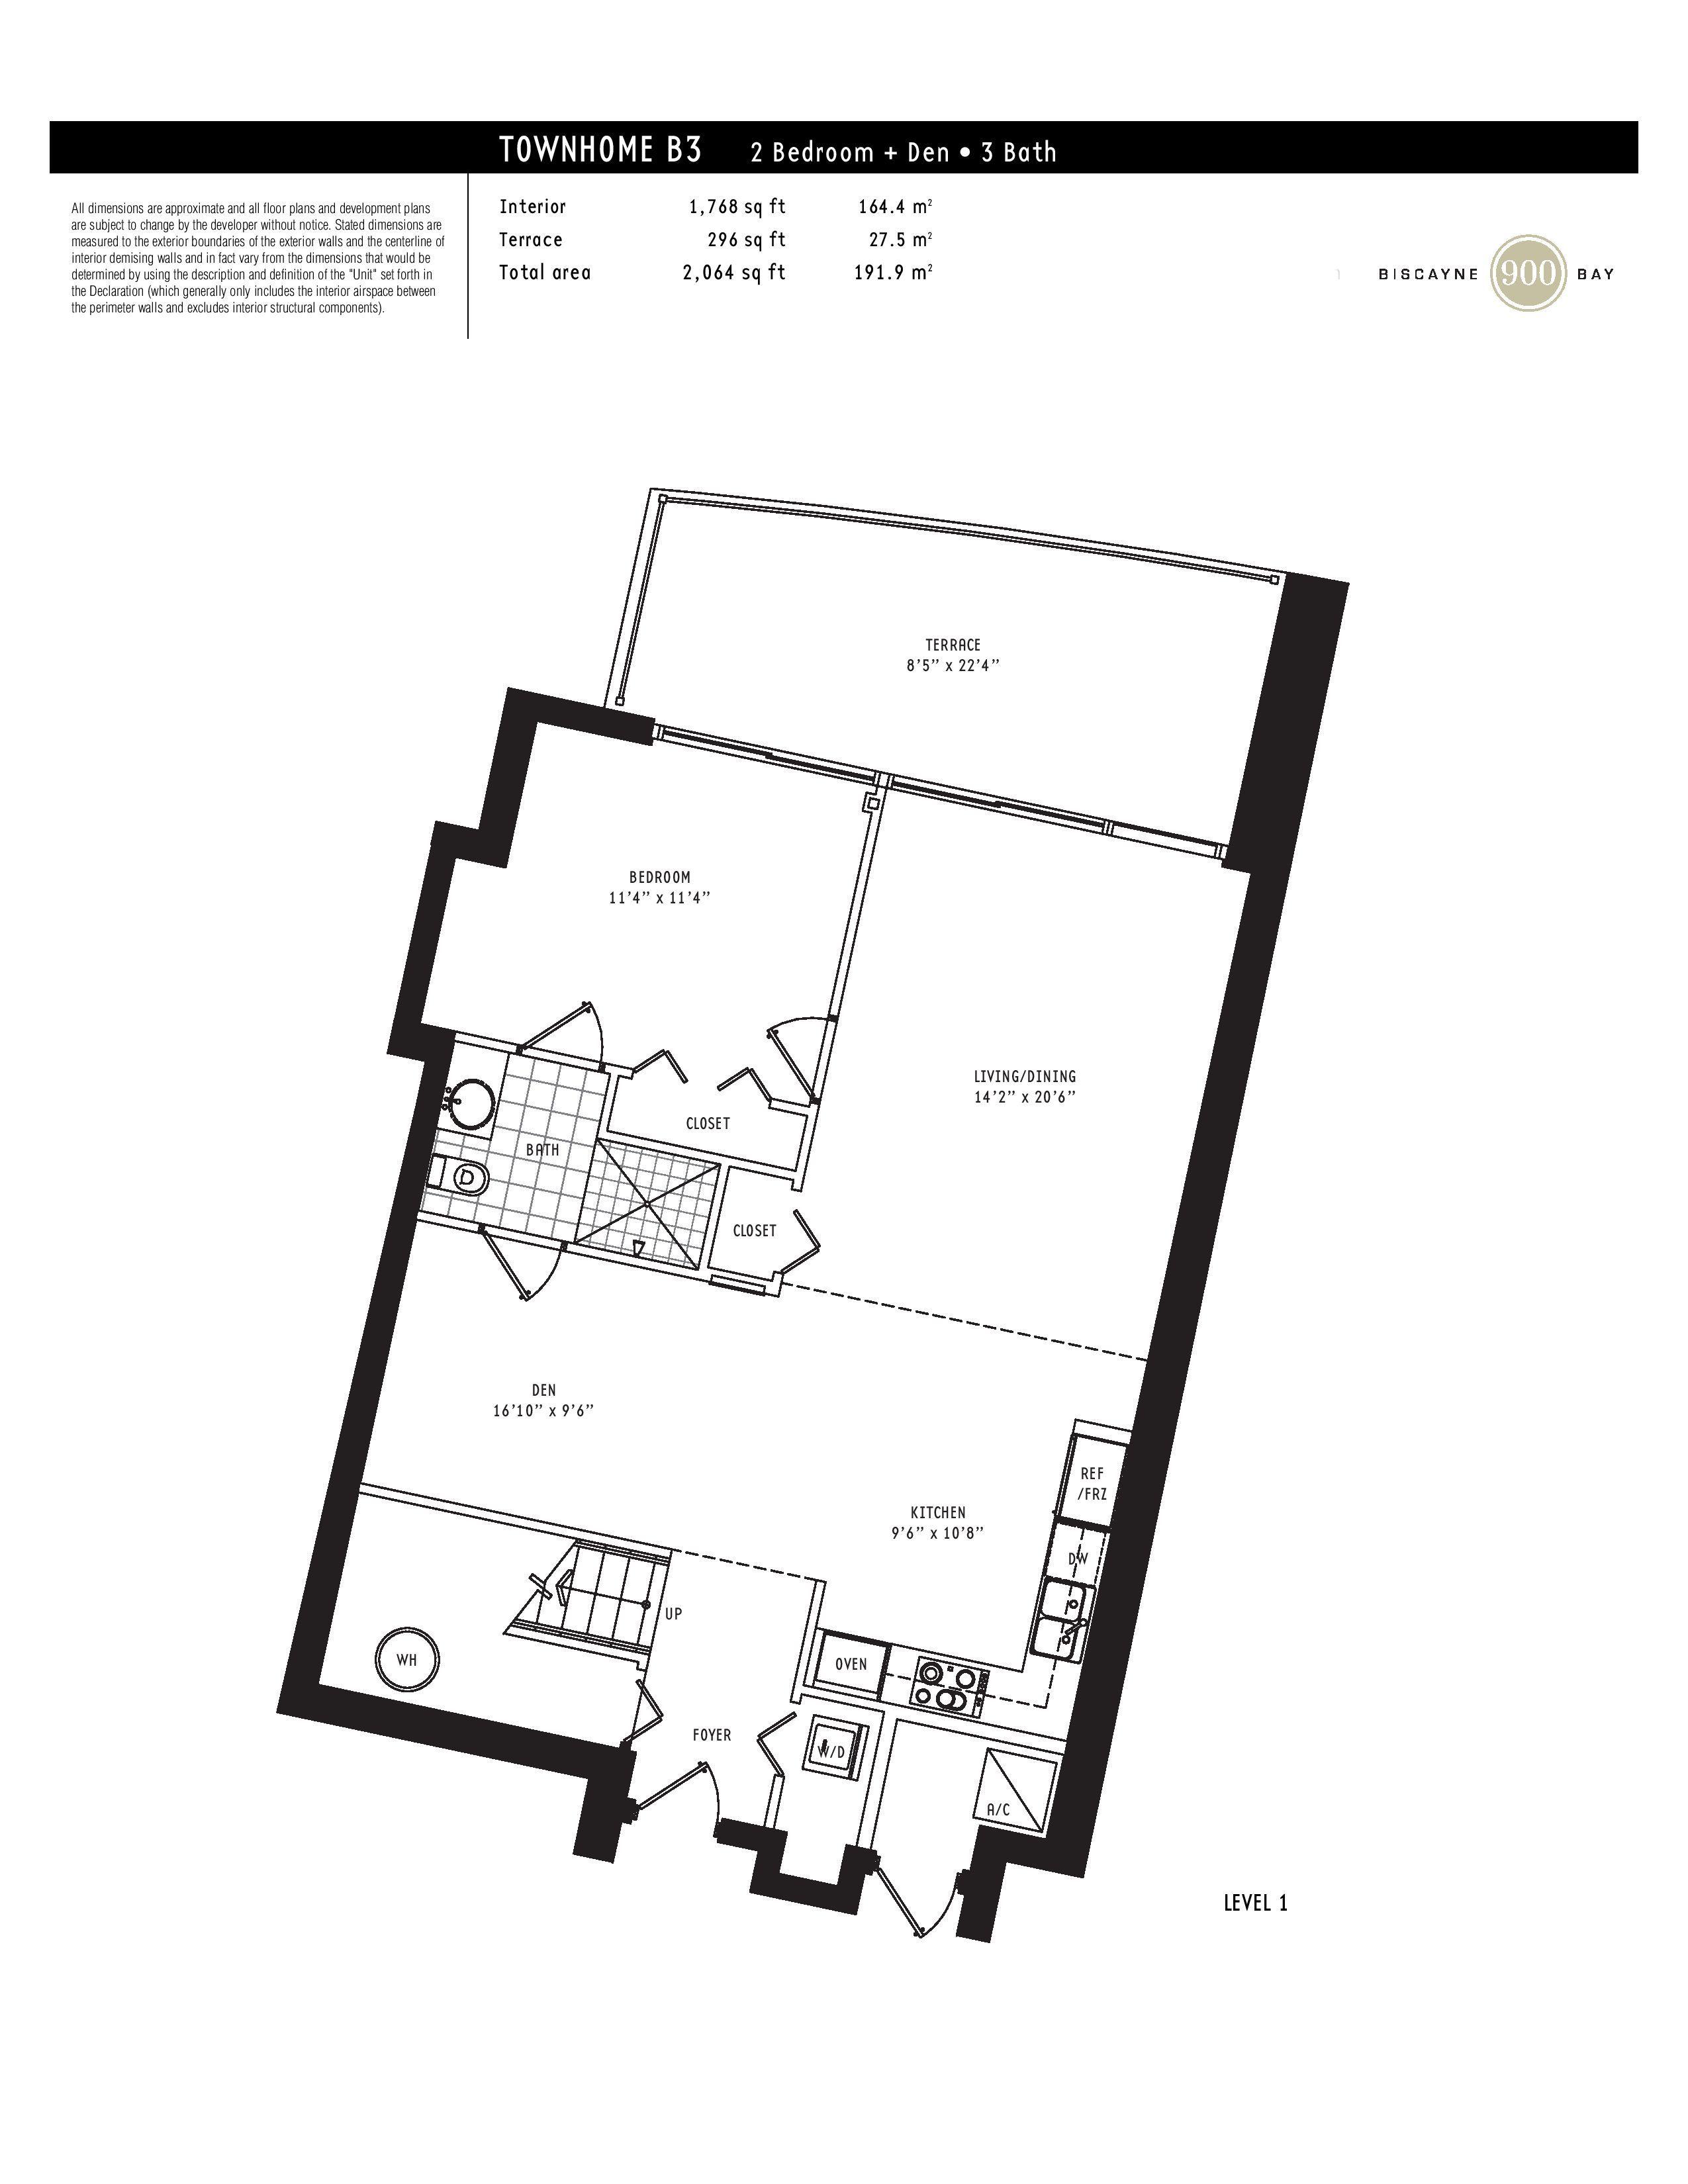 900 biscayne floor plans floor free download home plans